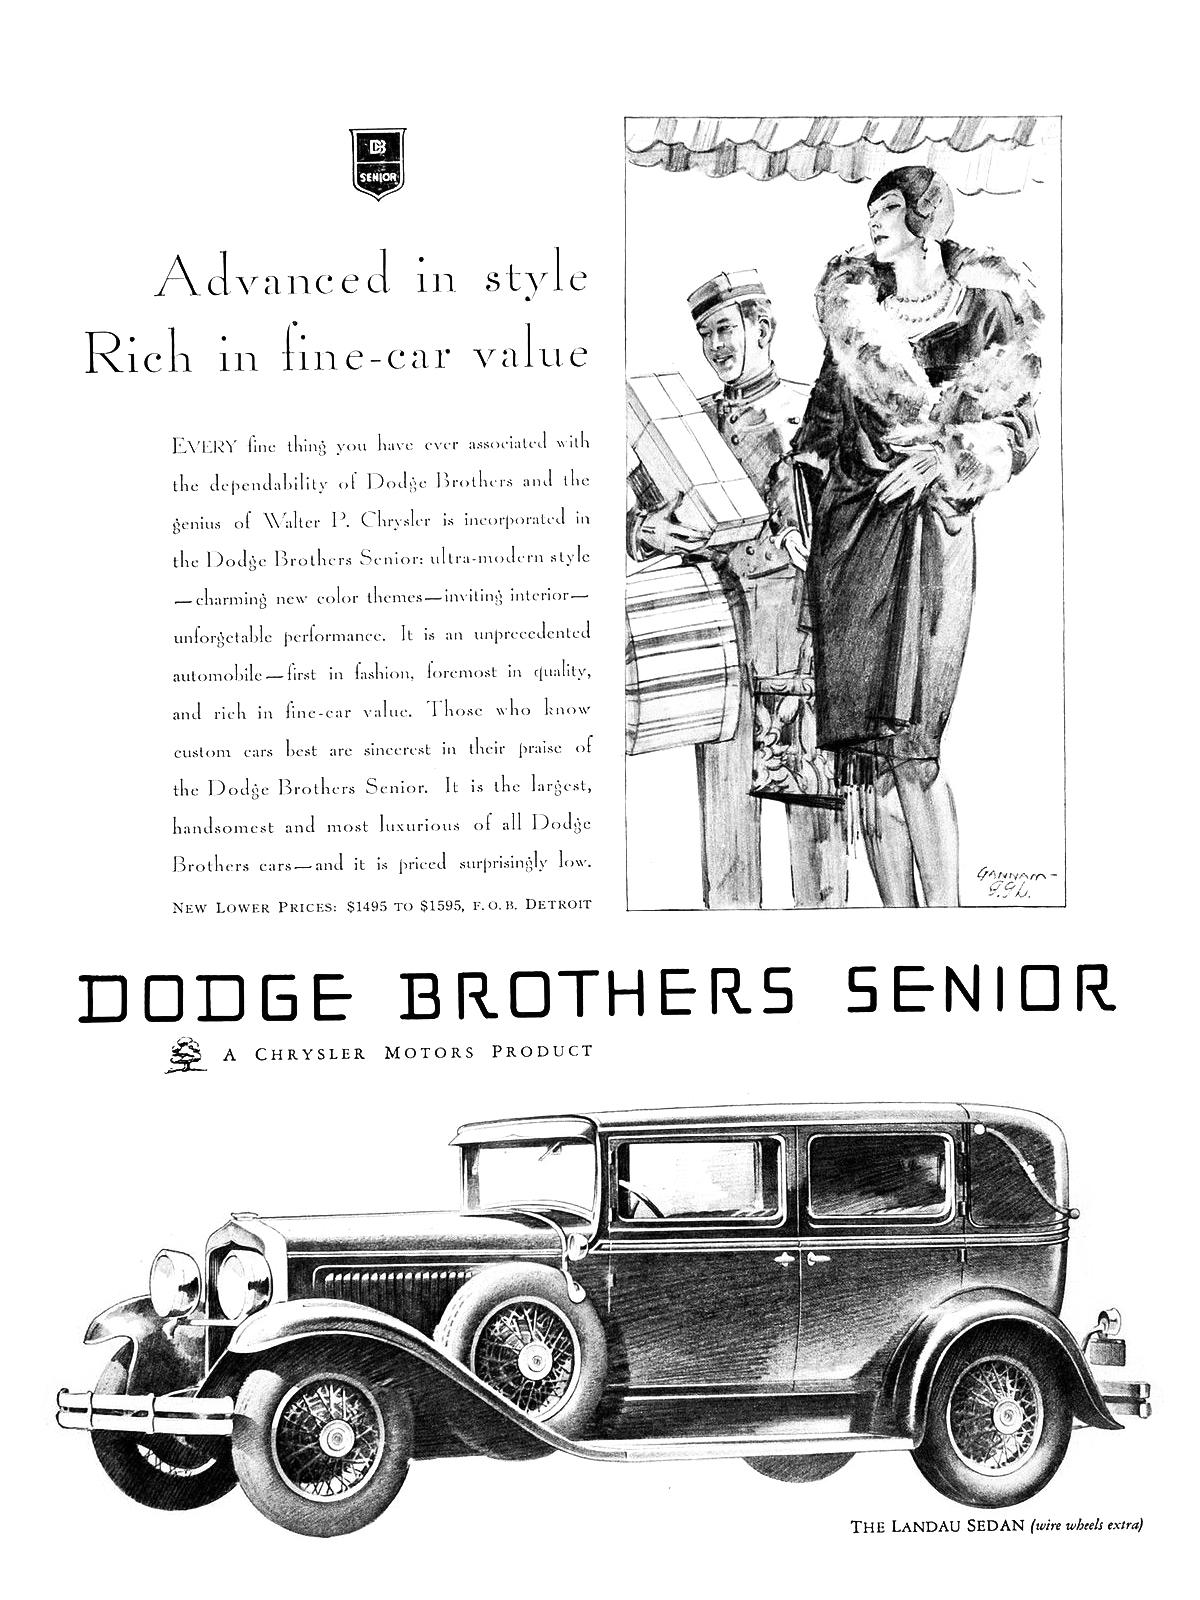 Dodge Brothers Senior Advertising Art by John Gannam (1929) - Blog